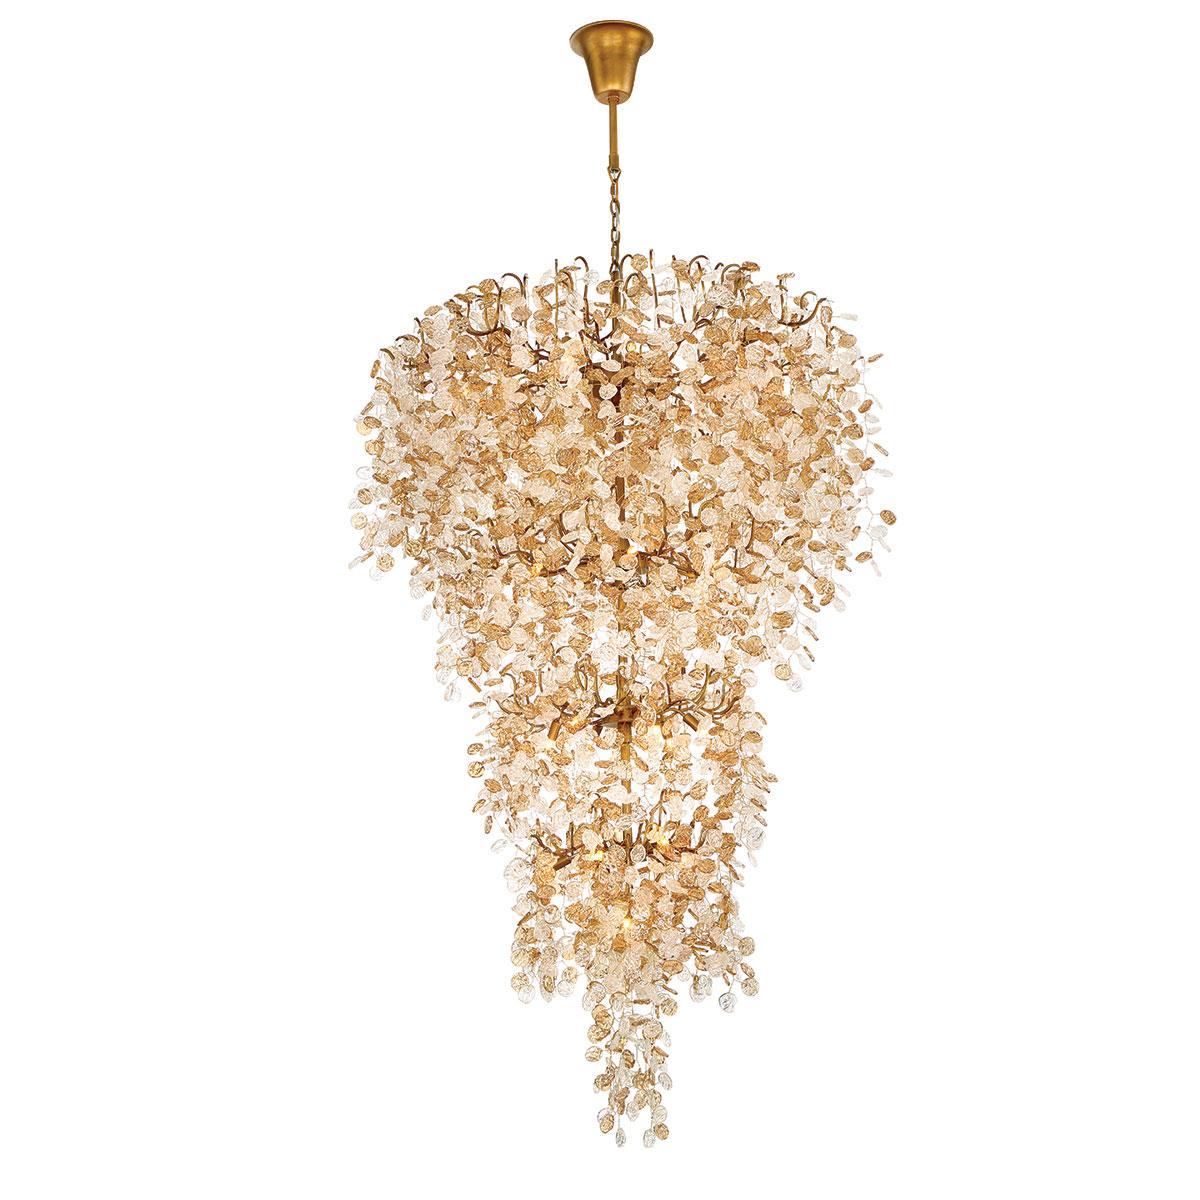 33 light chandelier by eurofase 29062 010 campobasso 33 light chandelier by eurofase 29062 010 arubaitofo Image collections